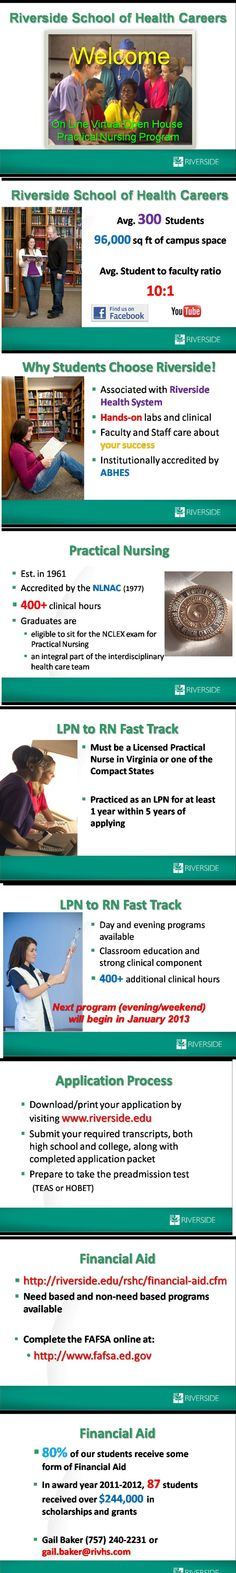 Practical Nursing Information  www.riverside.edu  or call Michael 757-240-2229